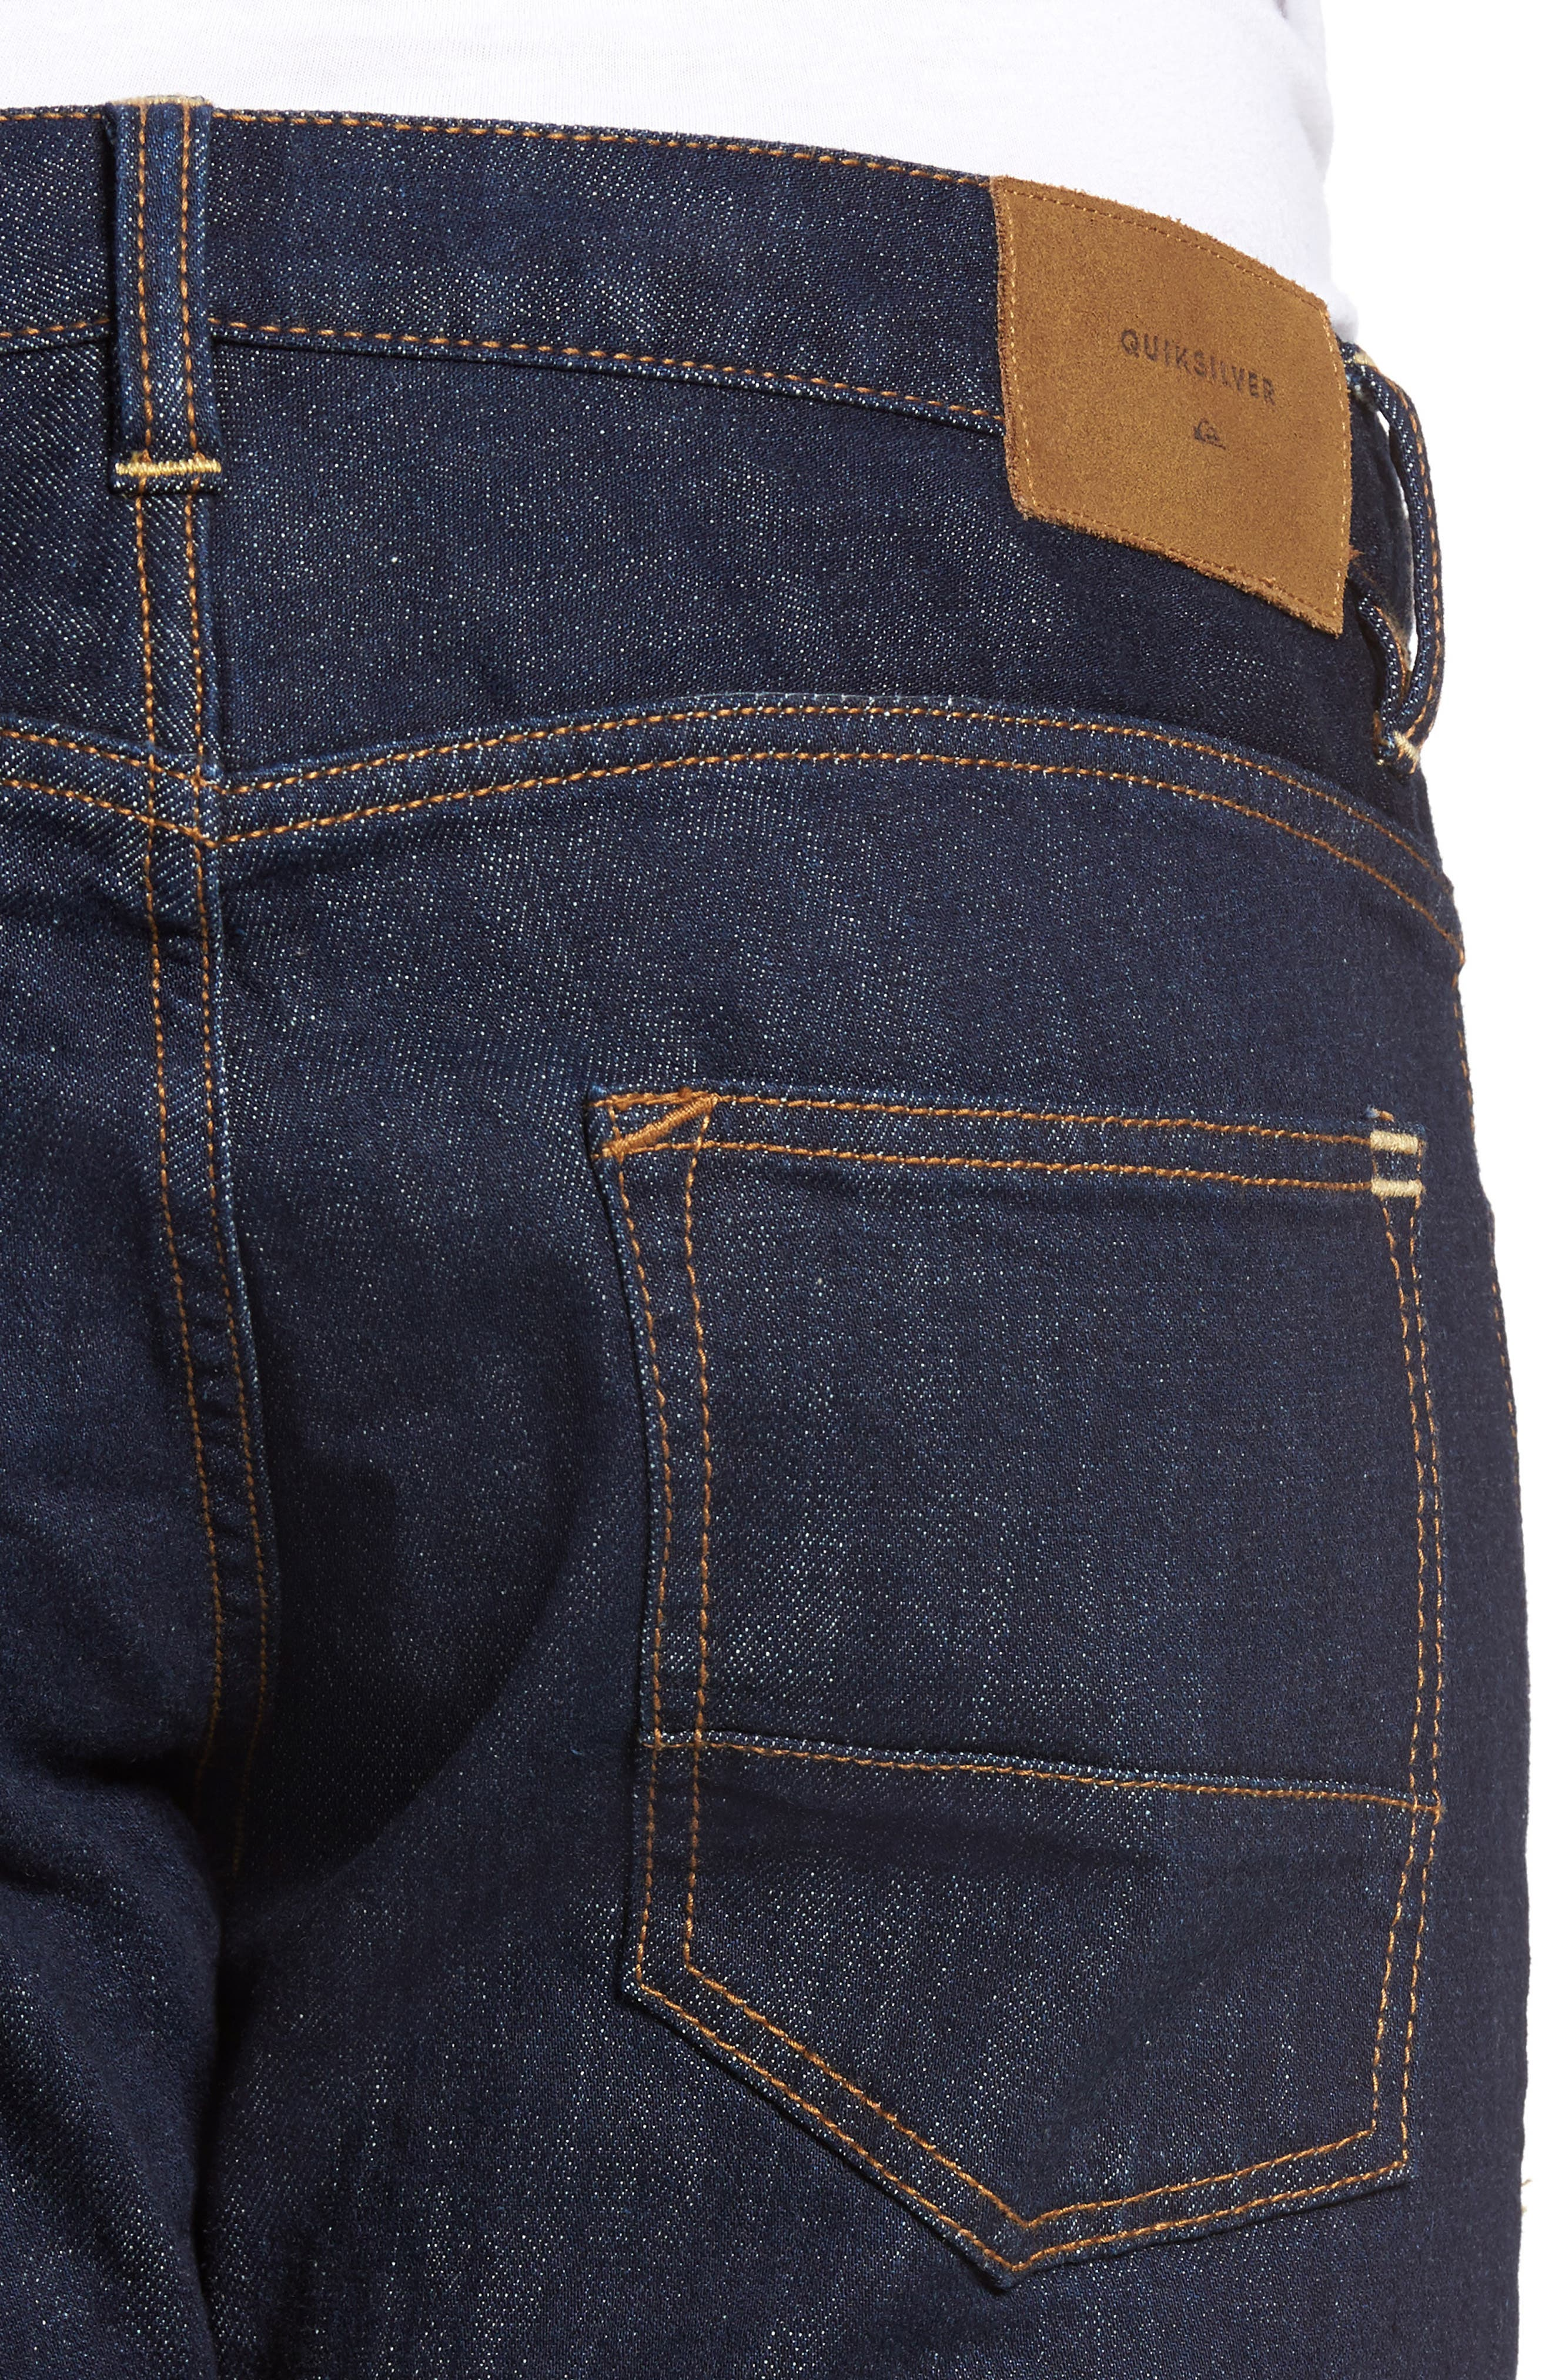 Revolver Slim Fit Jeans,                             Alternate thumbnail 4, color,                             401